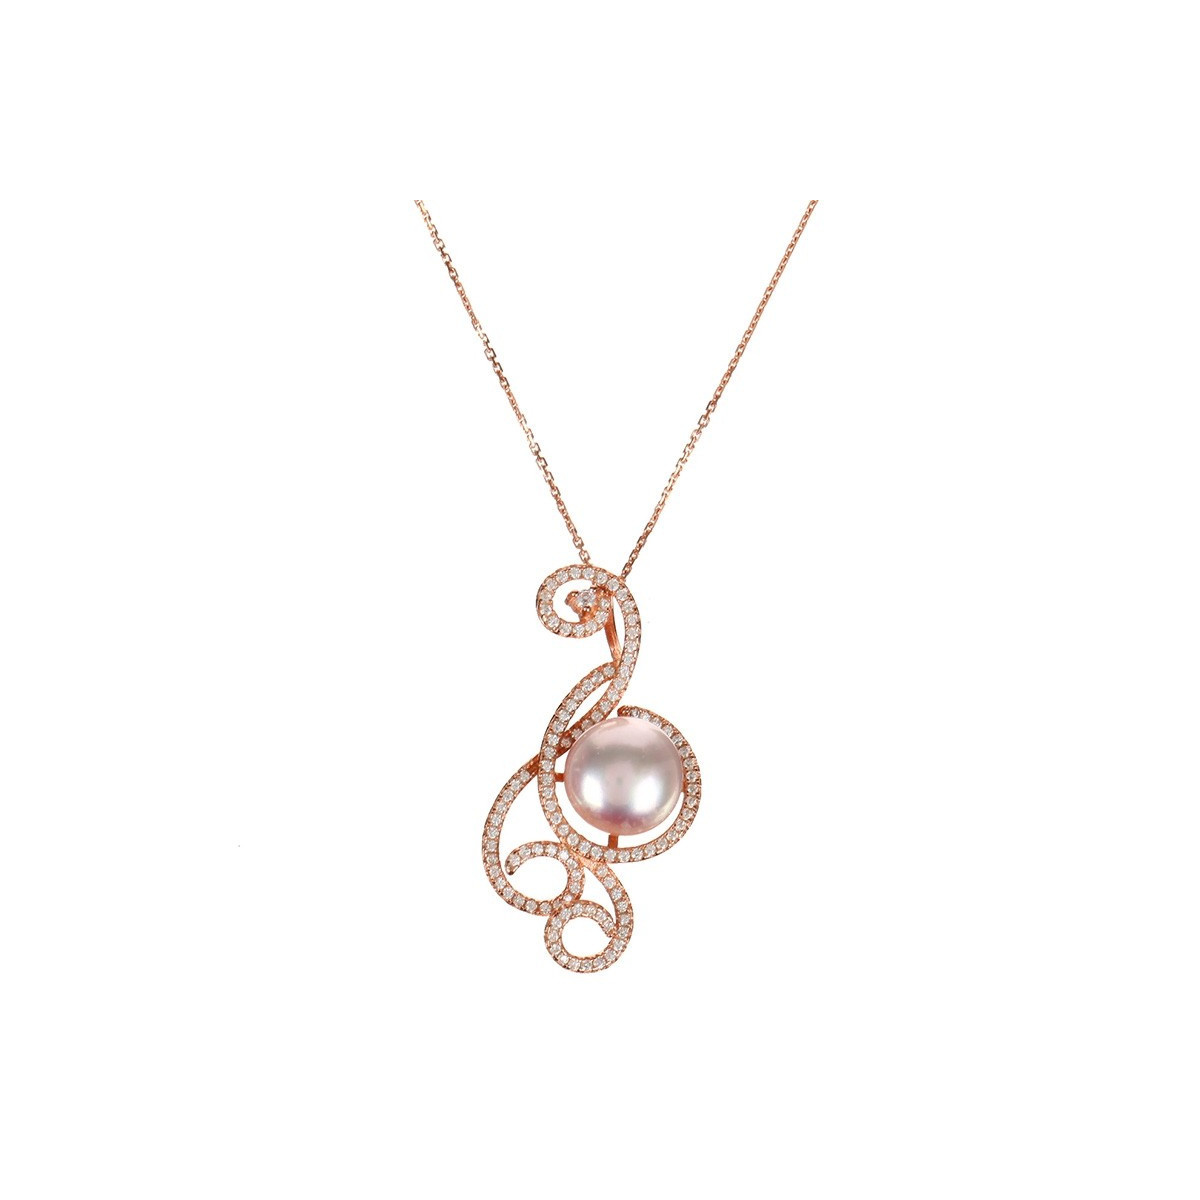 "Pendentif vermeil rose, oxydes de zirconium et perle de culture Rose ""Arabesque Orientale"" + chaîne vermeil rose offerte"